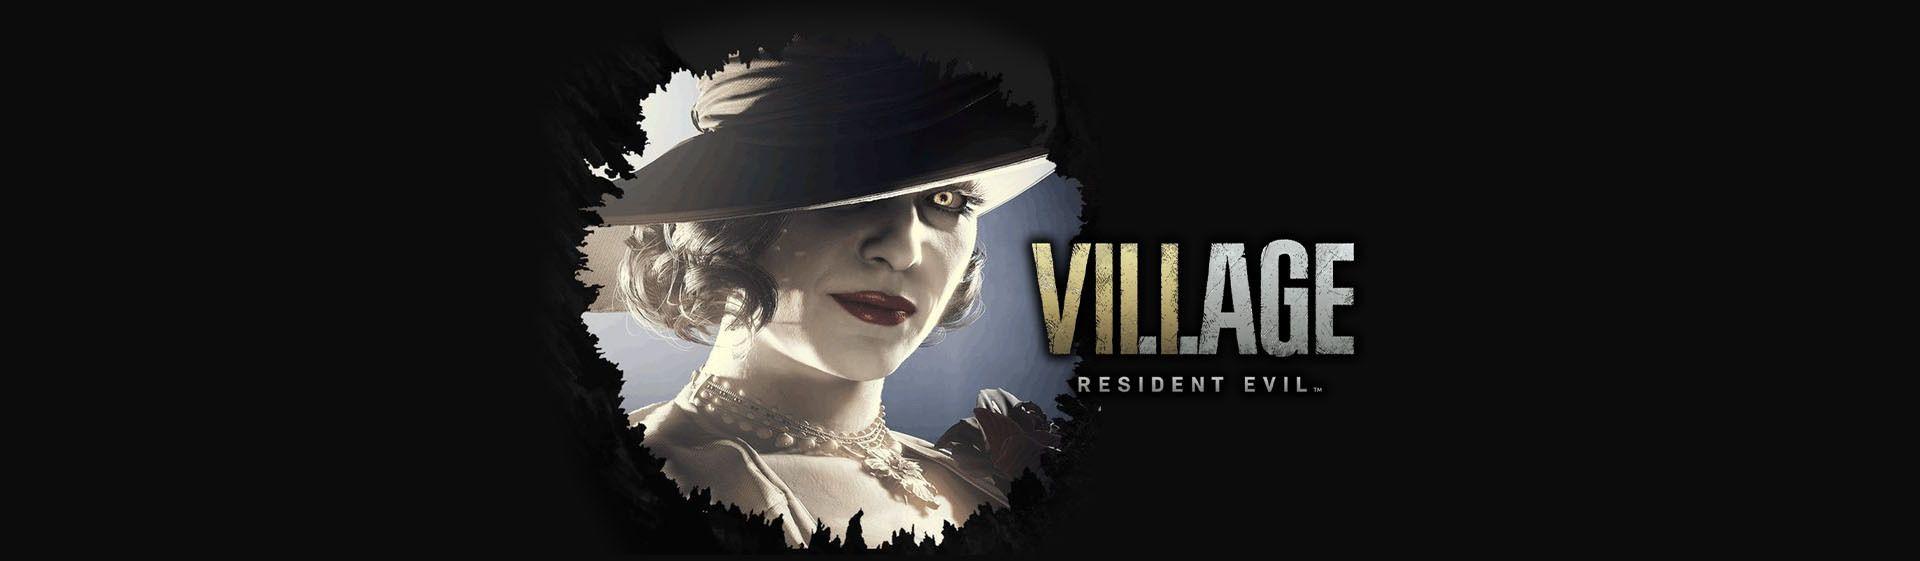 Resident Evil Village: como baixar o avatar gratuito para PS4 e PS5